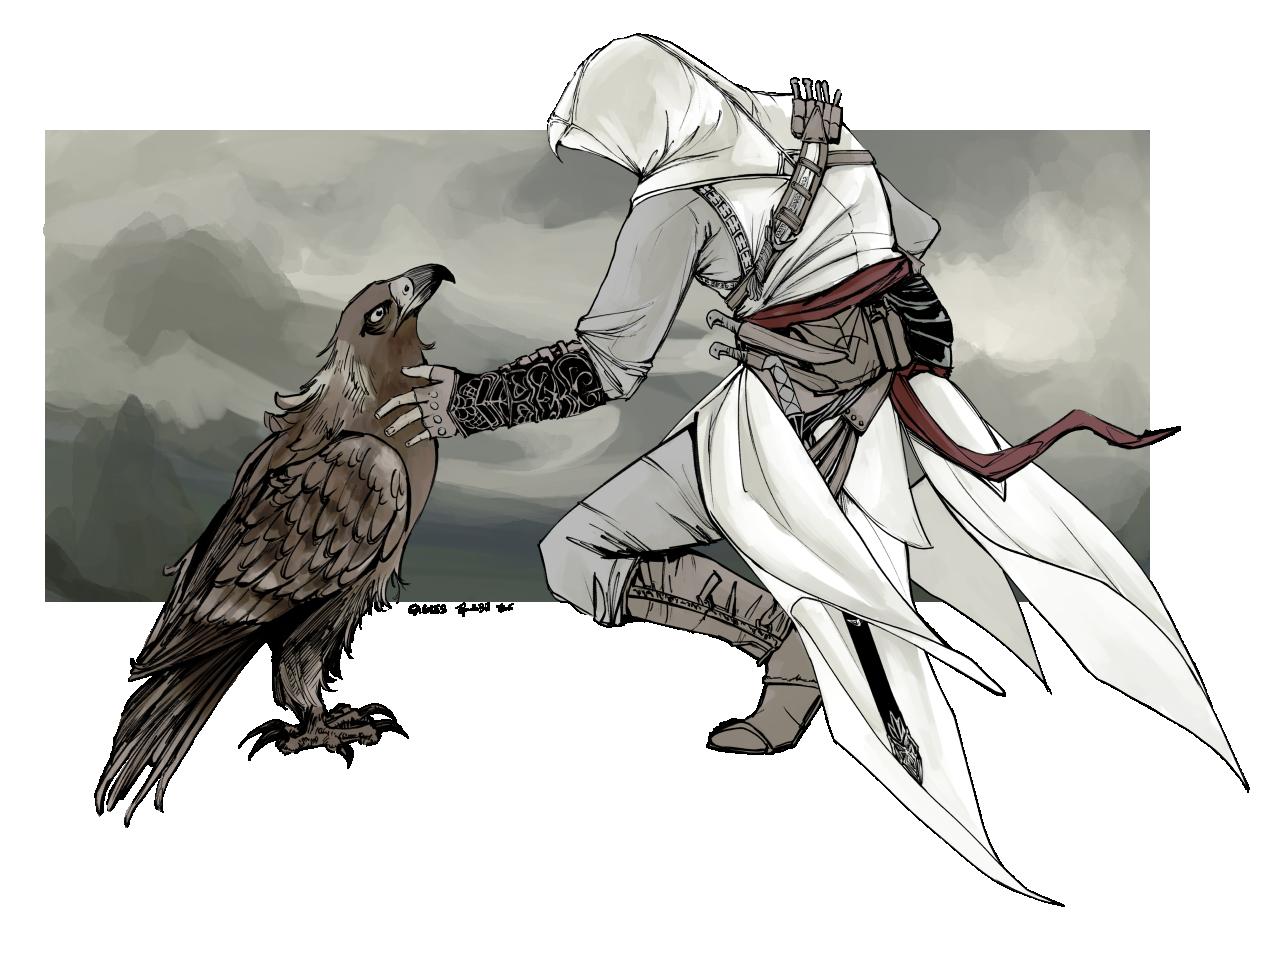 assassin's creed fanart | Tumblr | Assassin's Creed